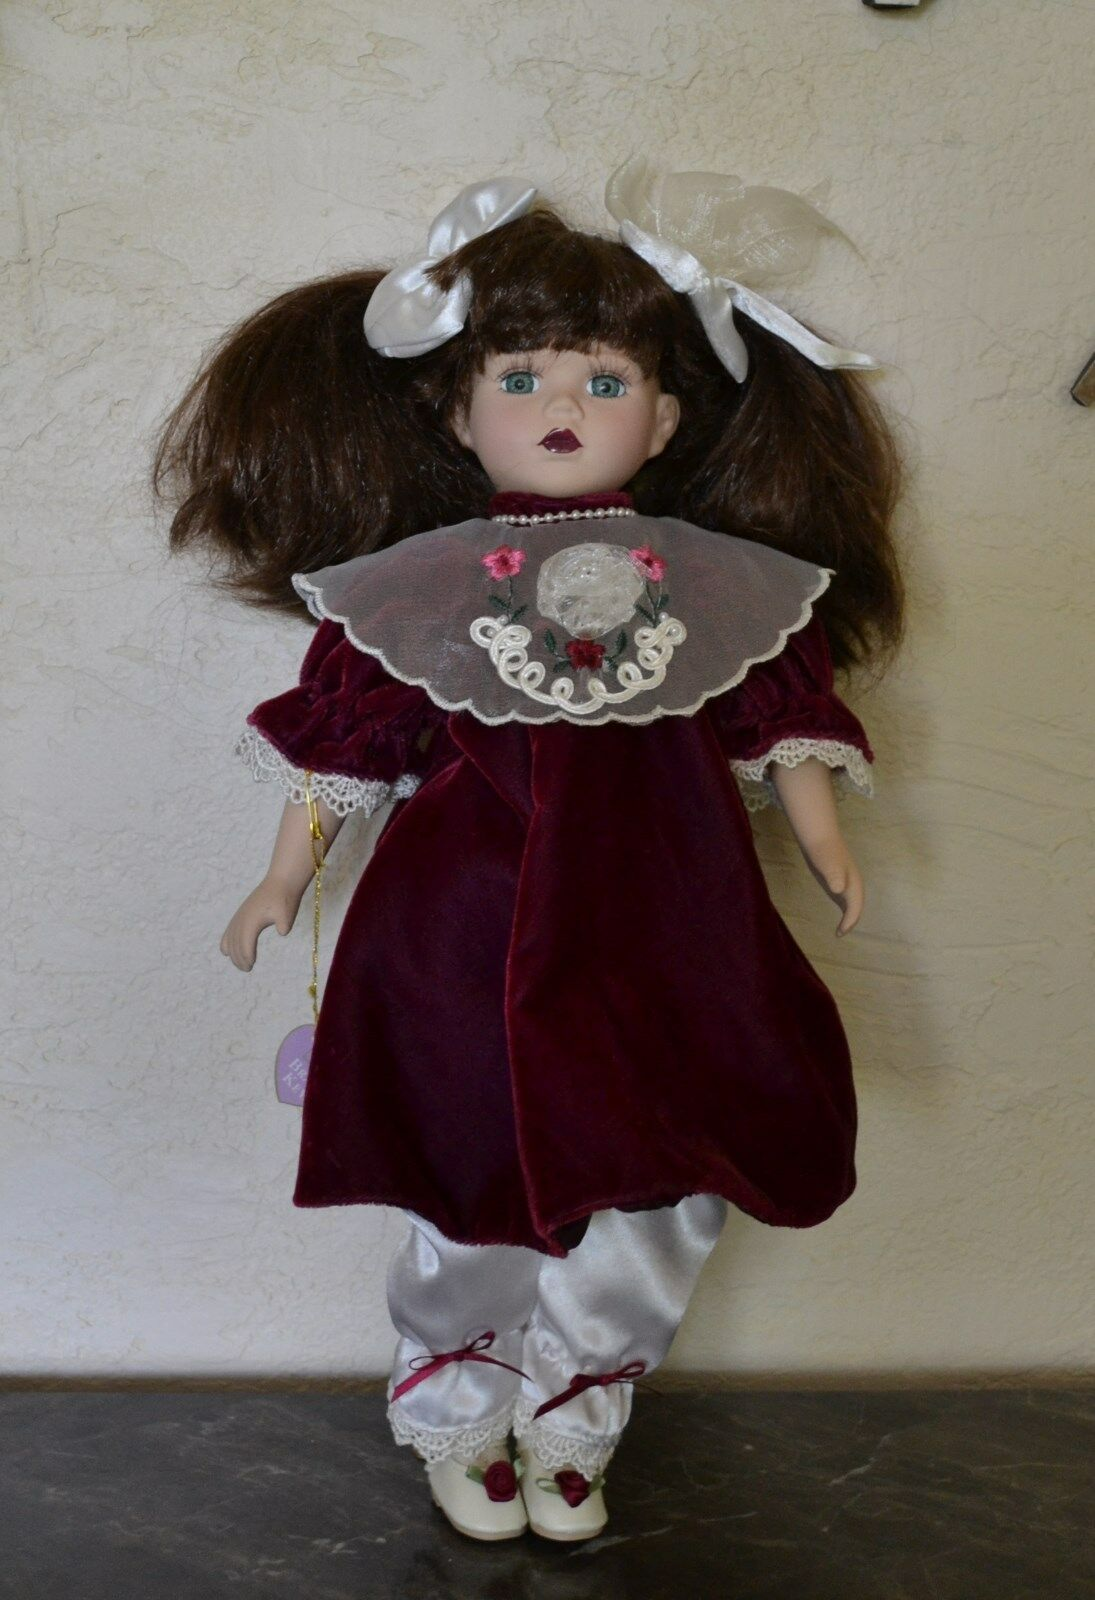 Porcelain Doll Vintage Brass Key  with Grün Glass Eyes, Braun Hair